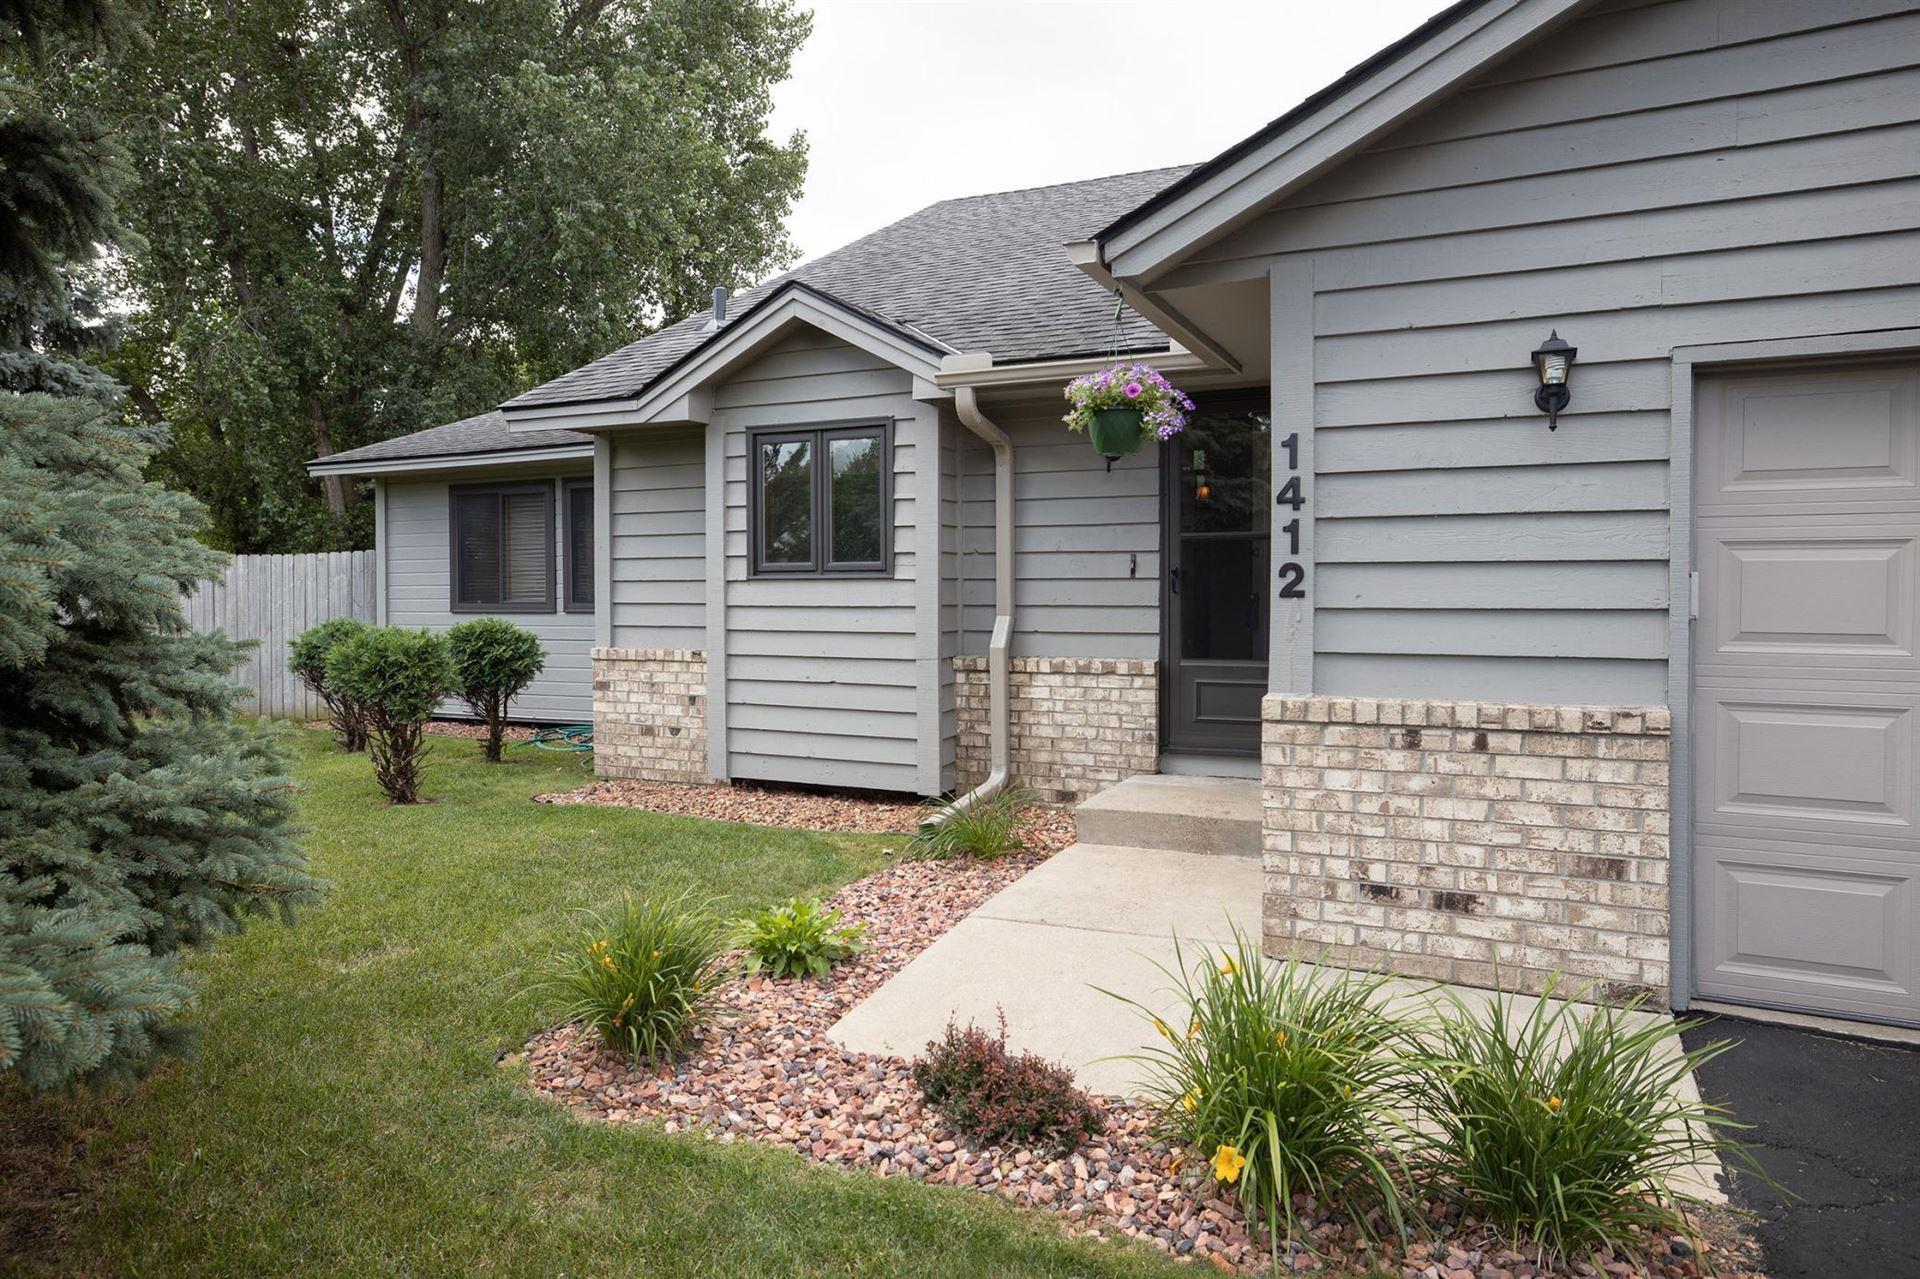 1412 Oster Drive, Eagan, MN 55121 - MLS#: 5628582